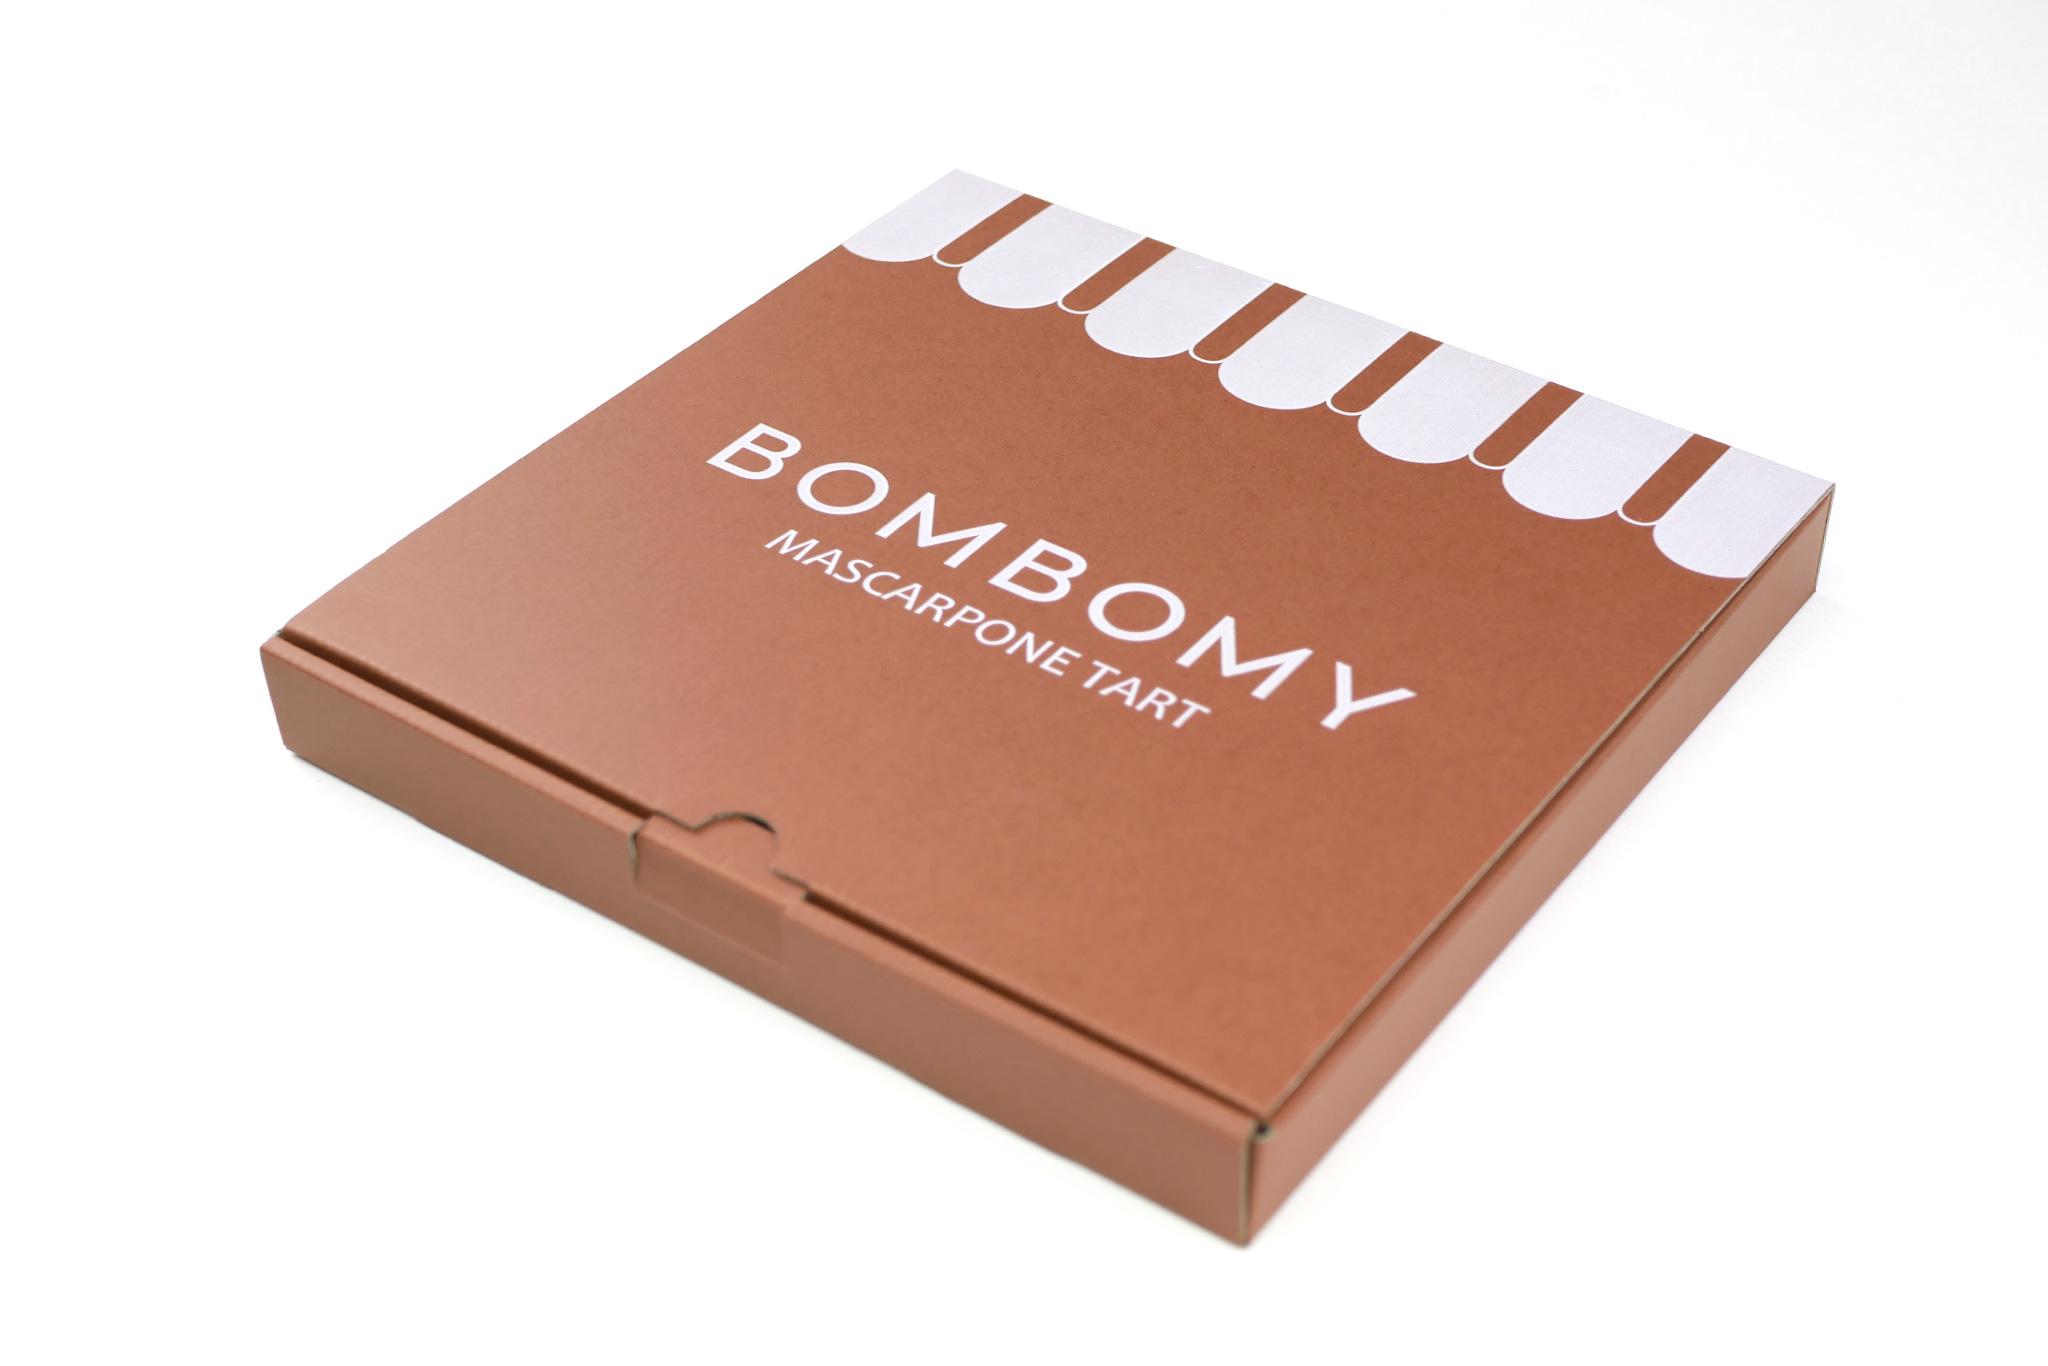 BOMBOMY チーズタルト 通販用パッケージの写真